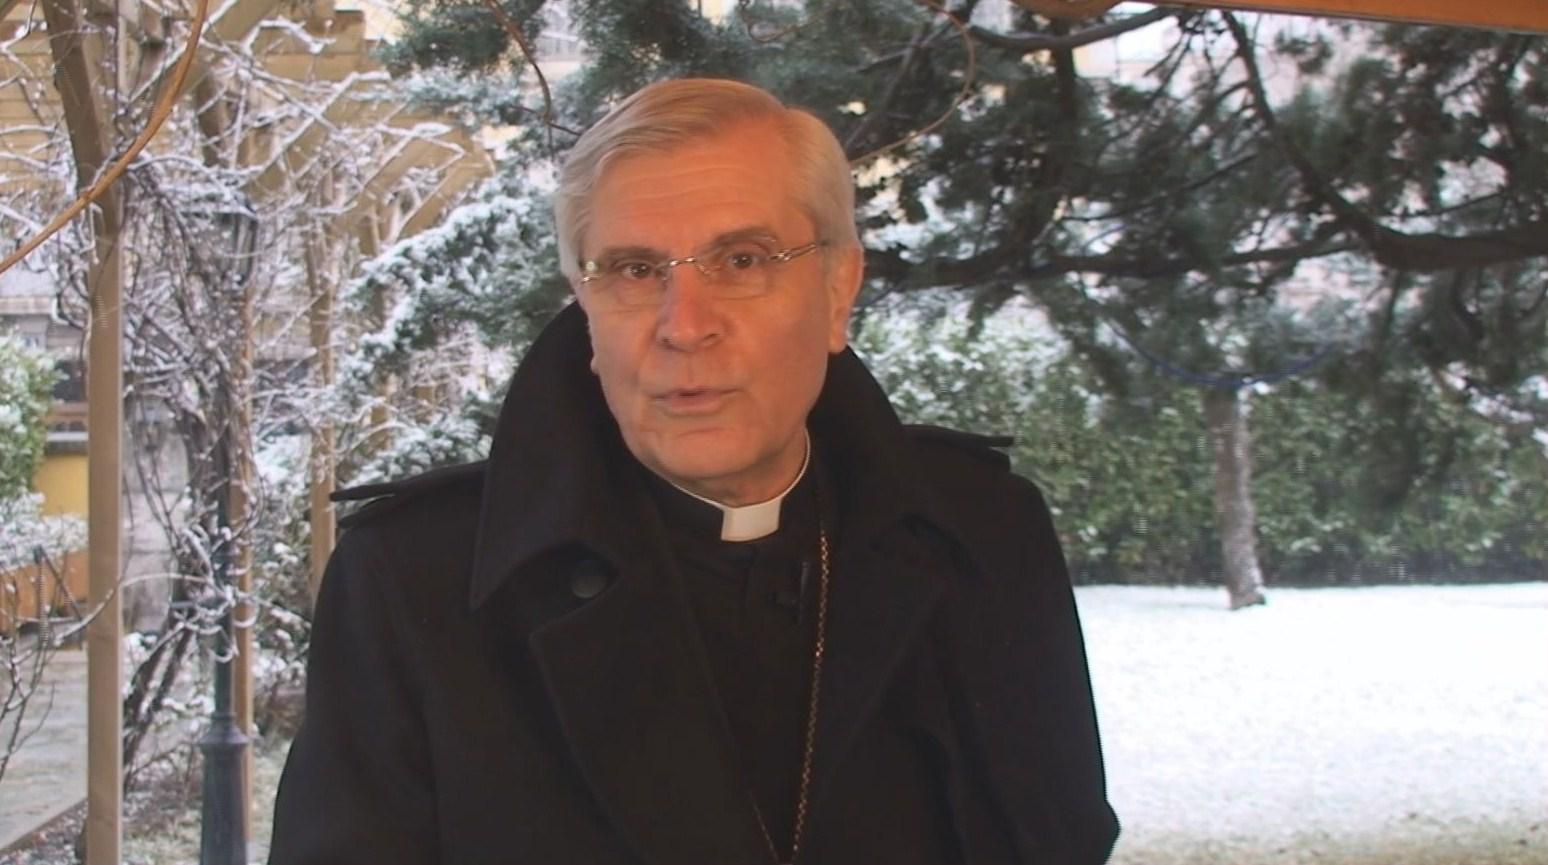 La chronique de Mgr Jean-Michel di Falco Léandri sur le genre de Dieu